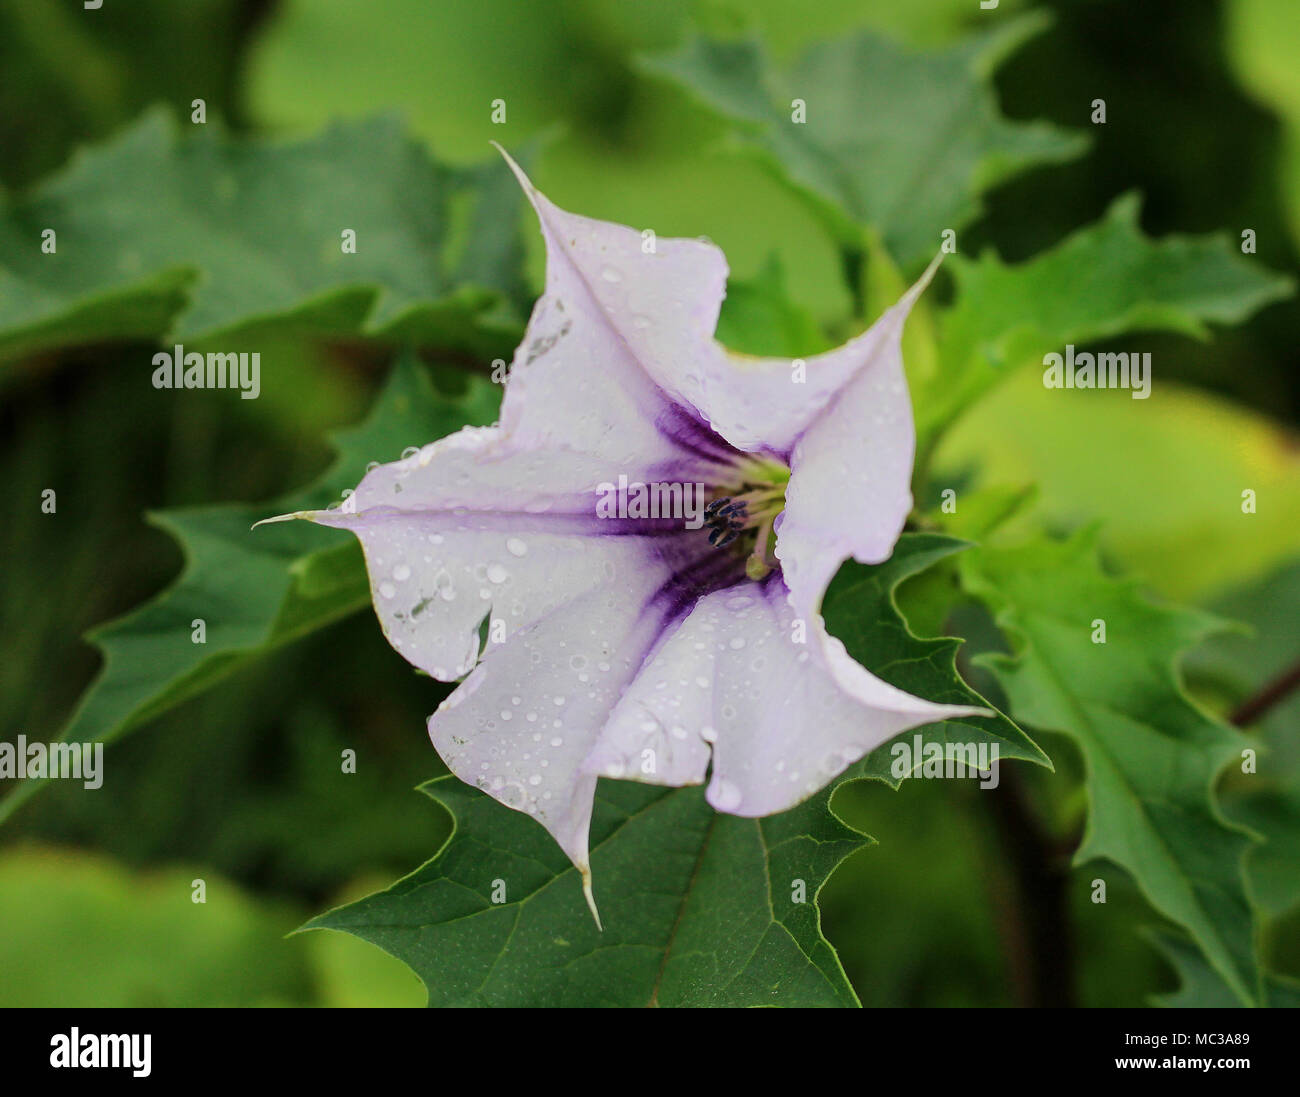 Datura stramonium jimsonweed or devils snare dangerous poisonous datura stramonium jimsonweed or devils snare dangerous poisonous plant with beautiful white flower mightylinksfo